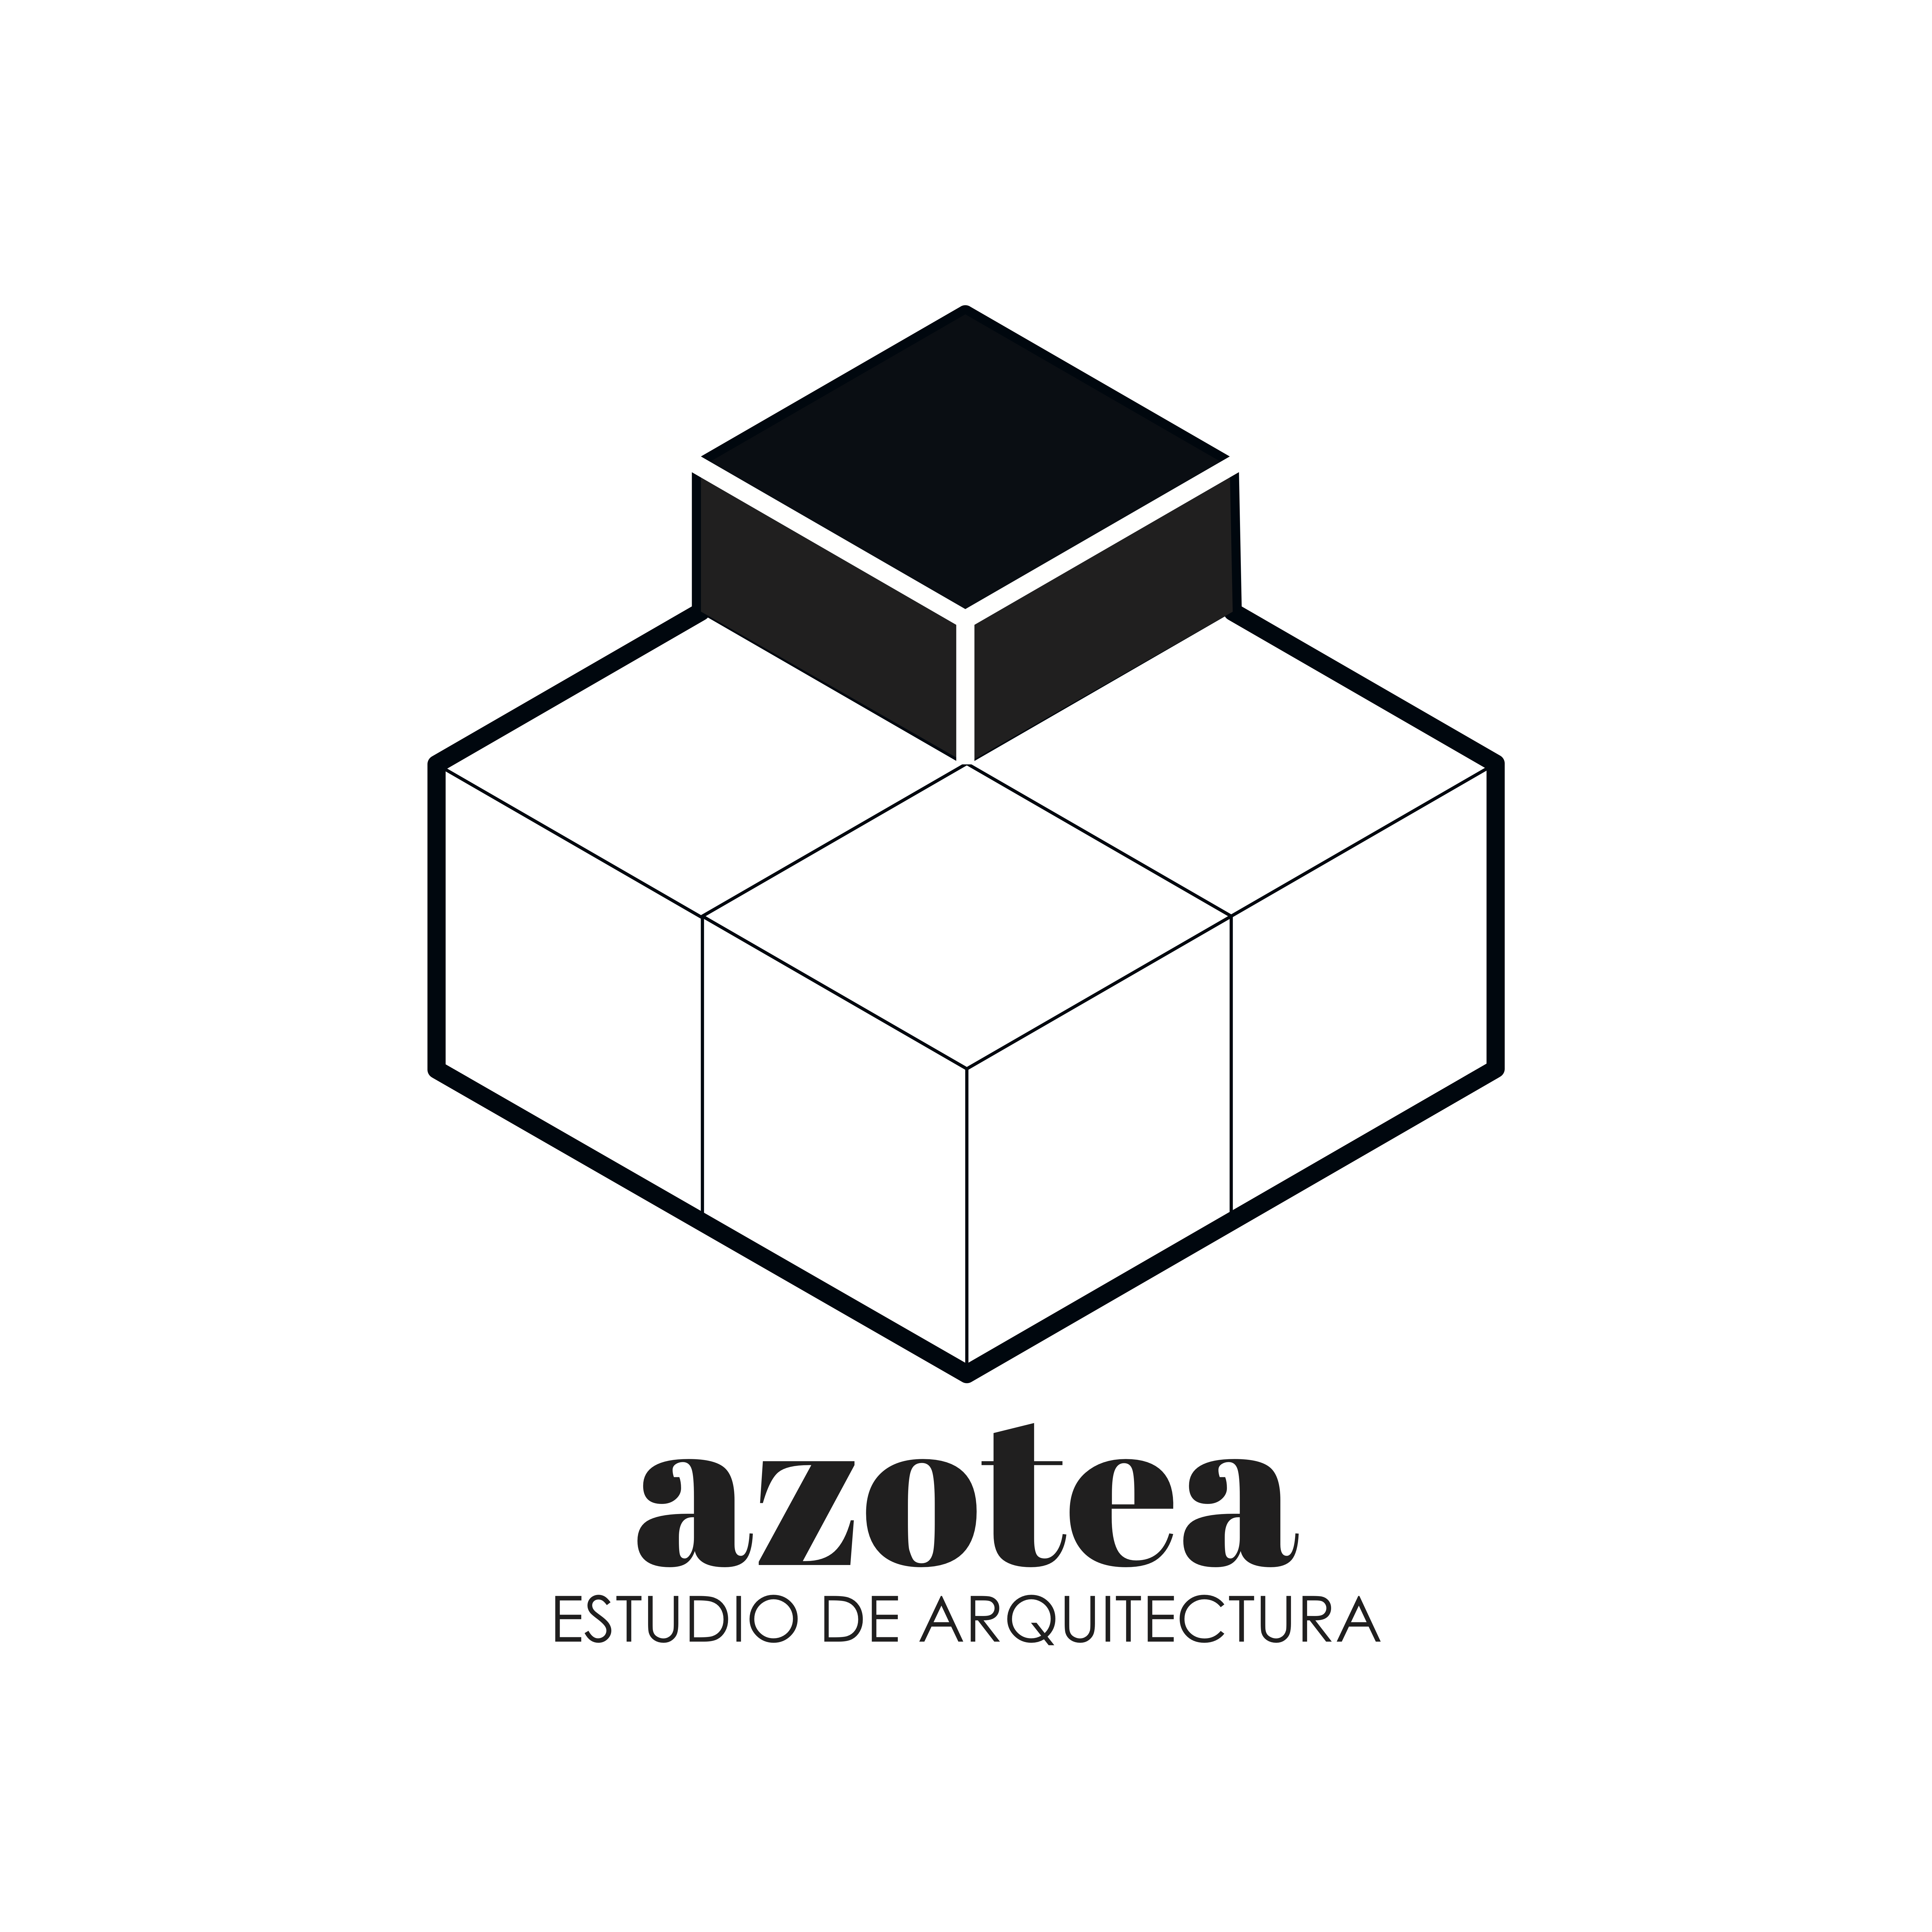 Azotea Estudio